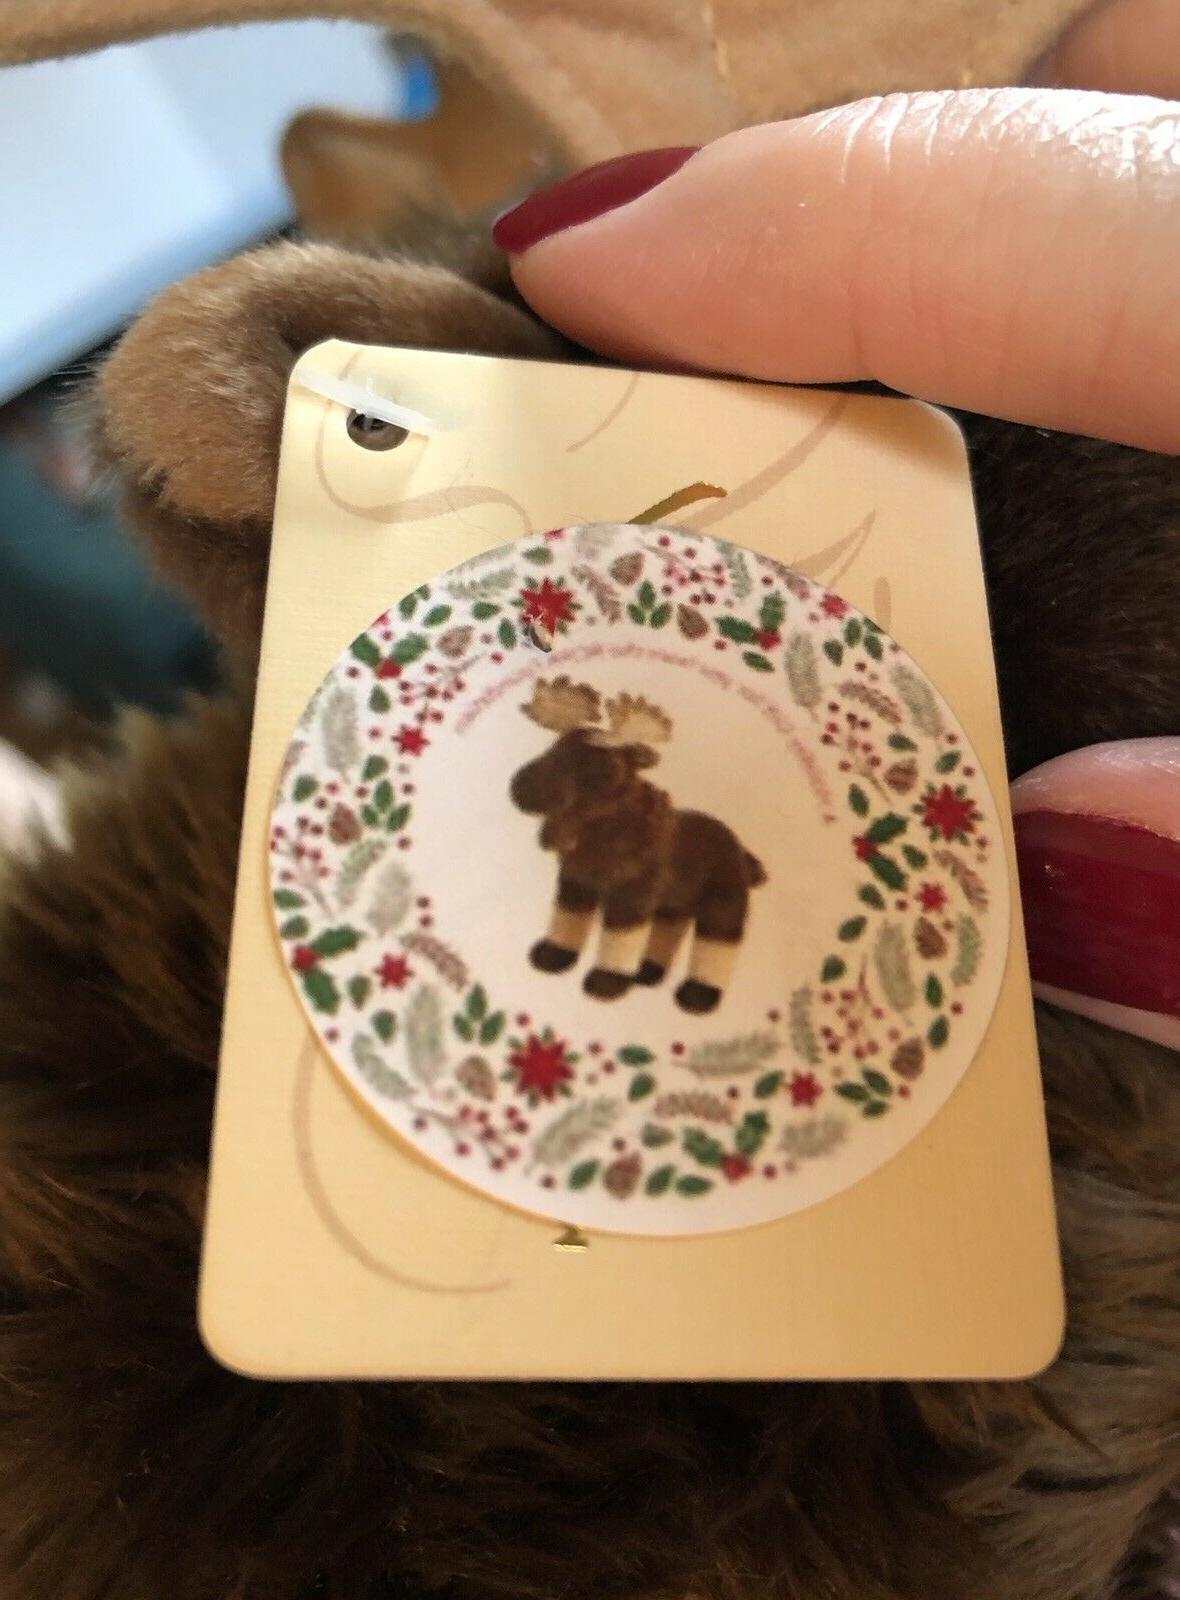 NEW WITH Miyoni Aurora Moose Stuffed Animal